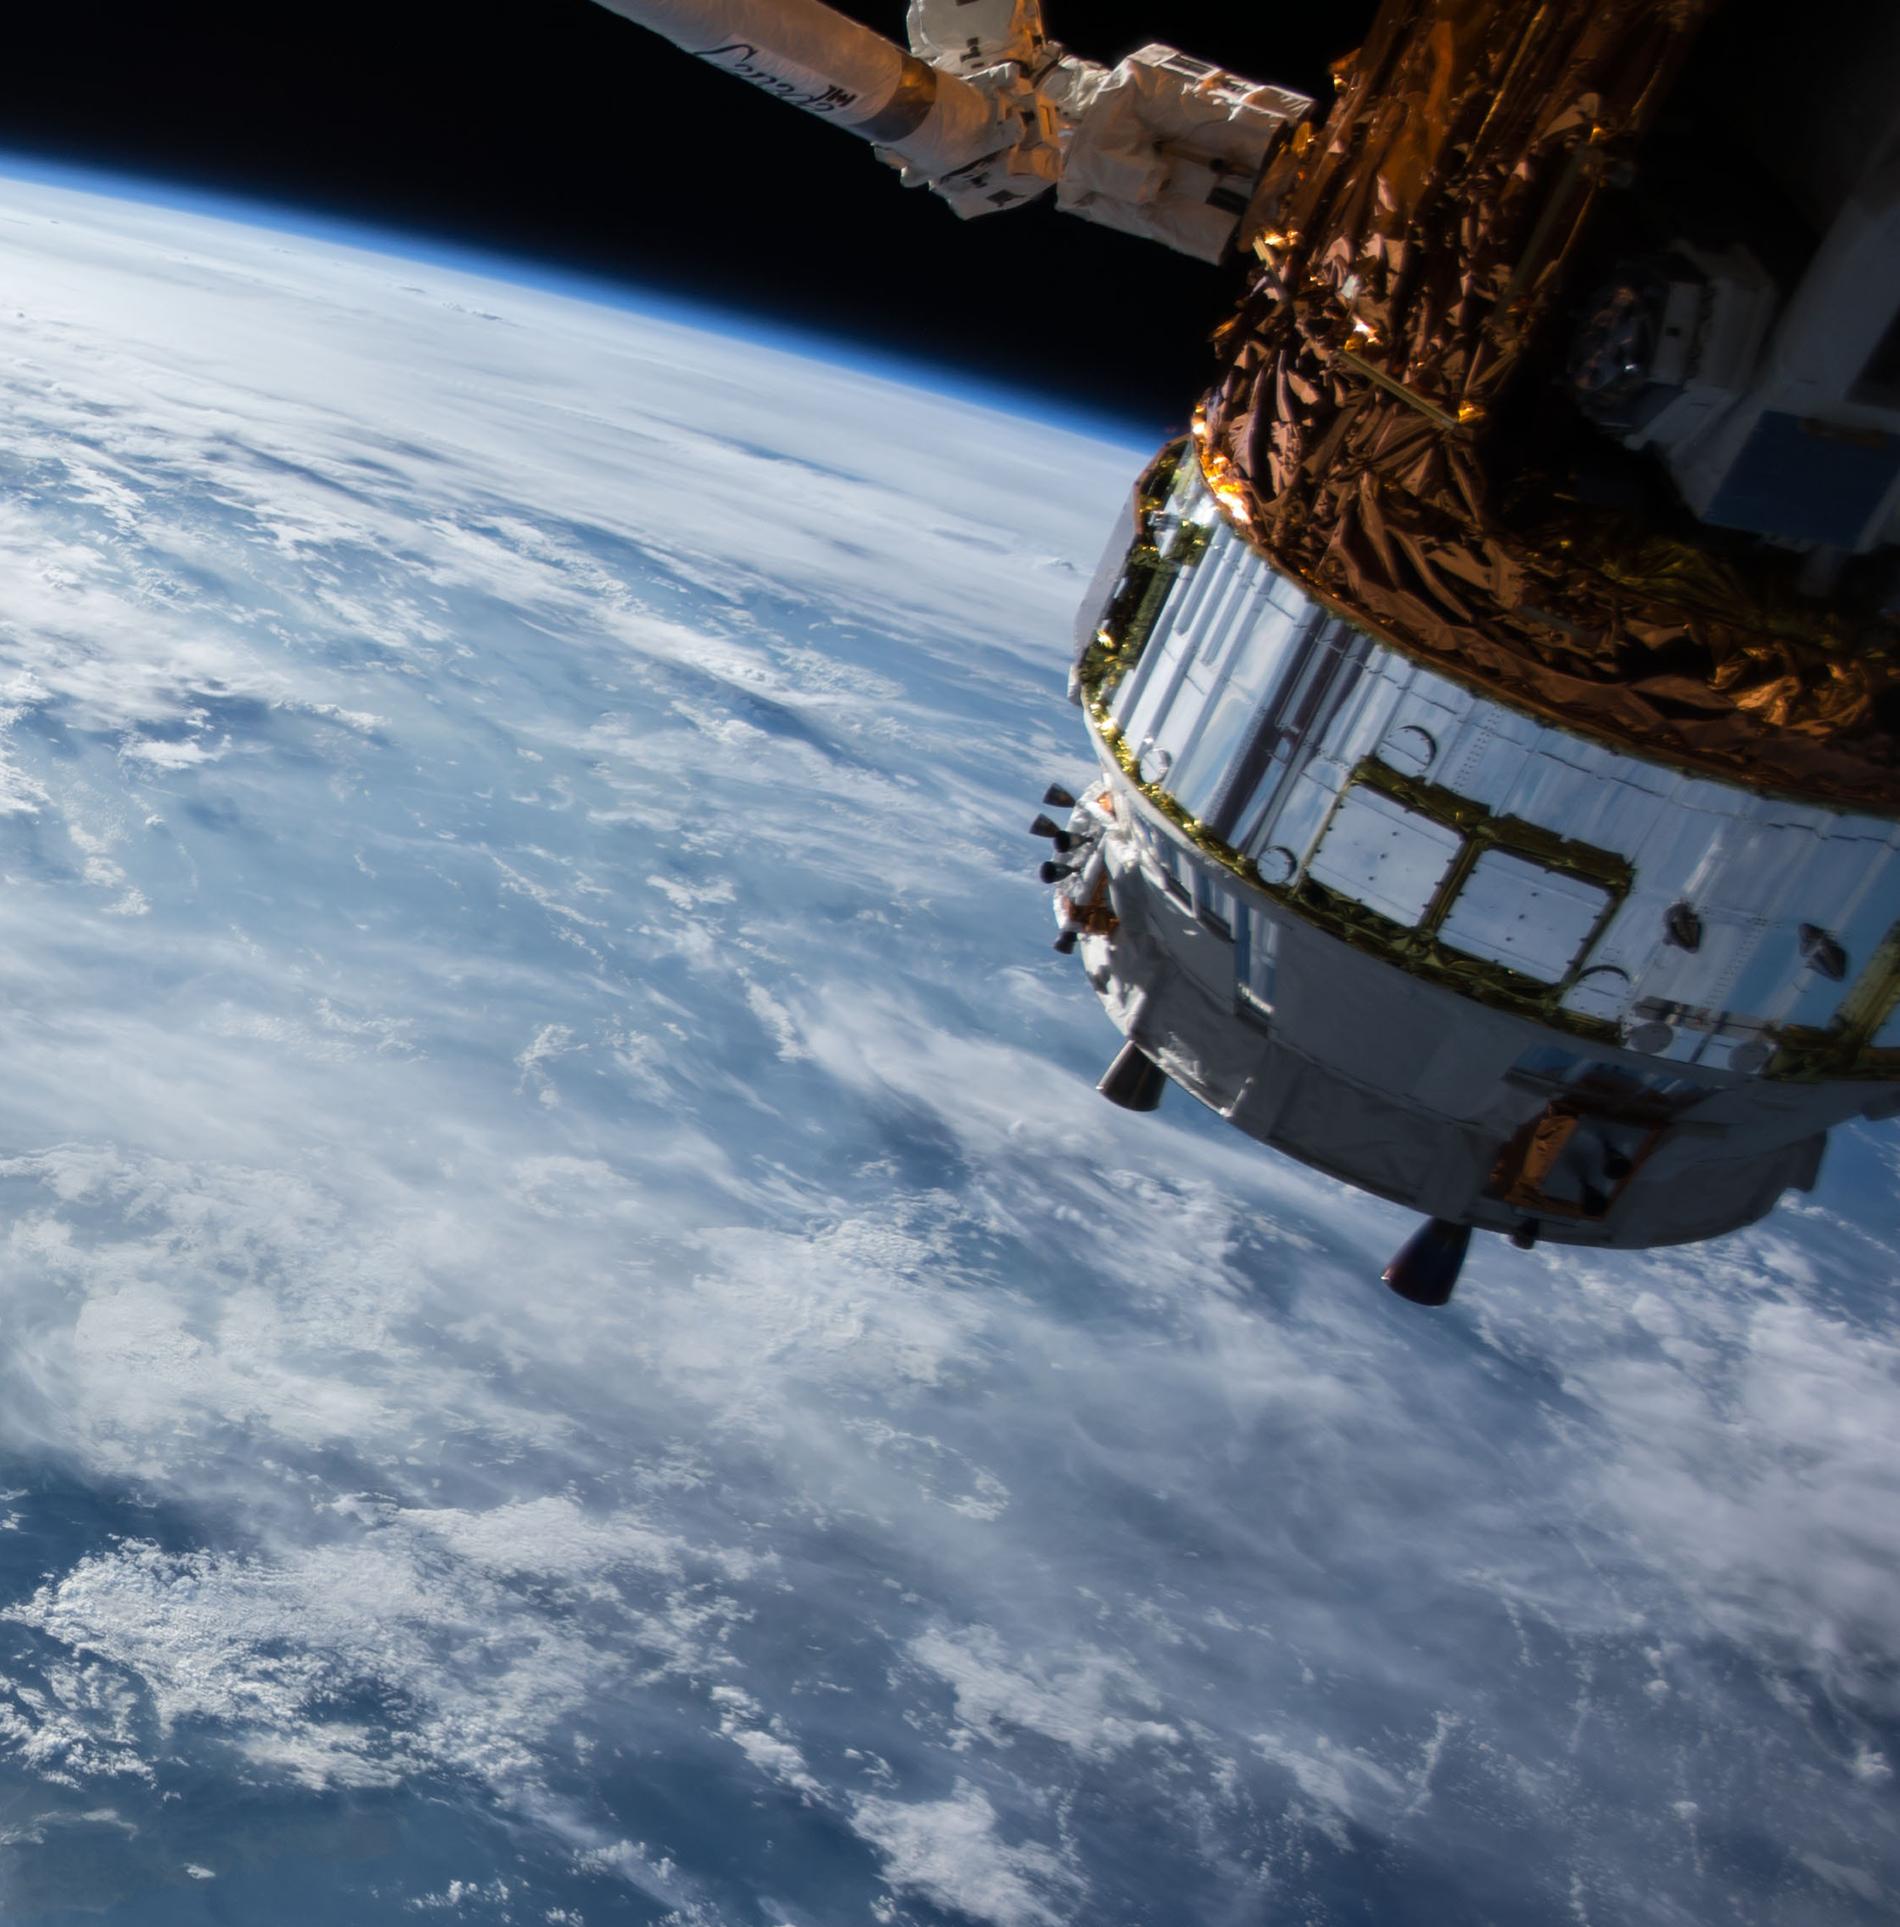 Image: Satellite orbiting Earth. Source: Unsplash